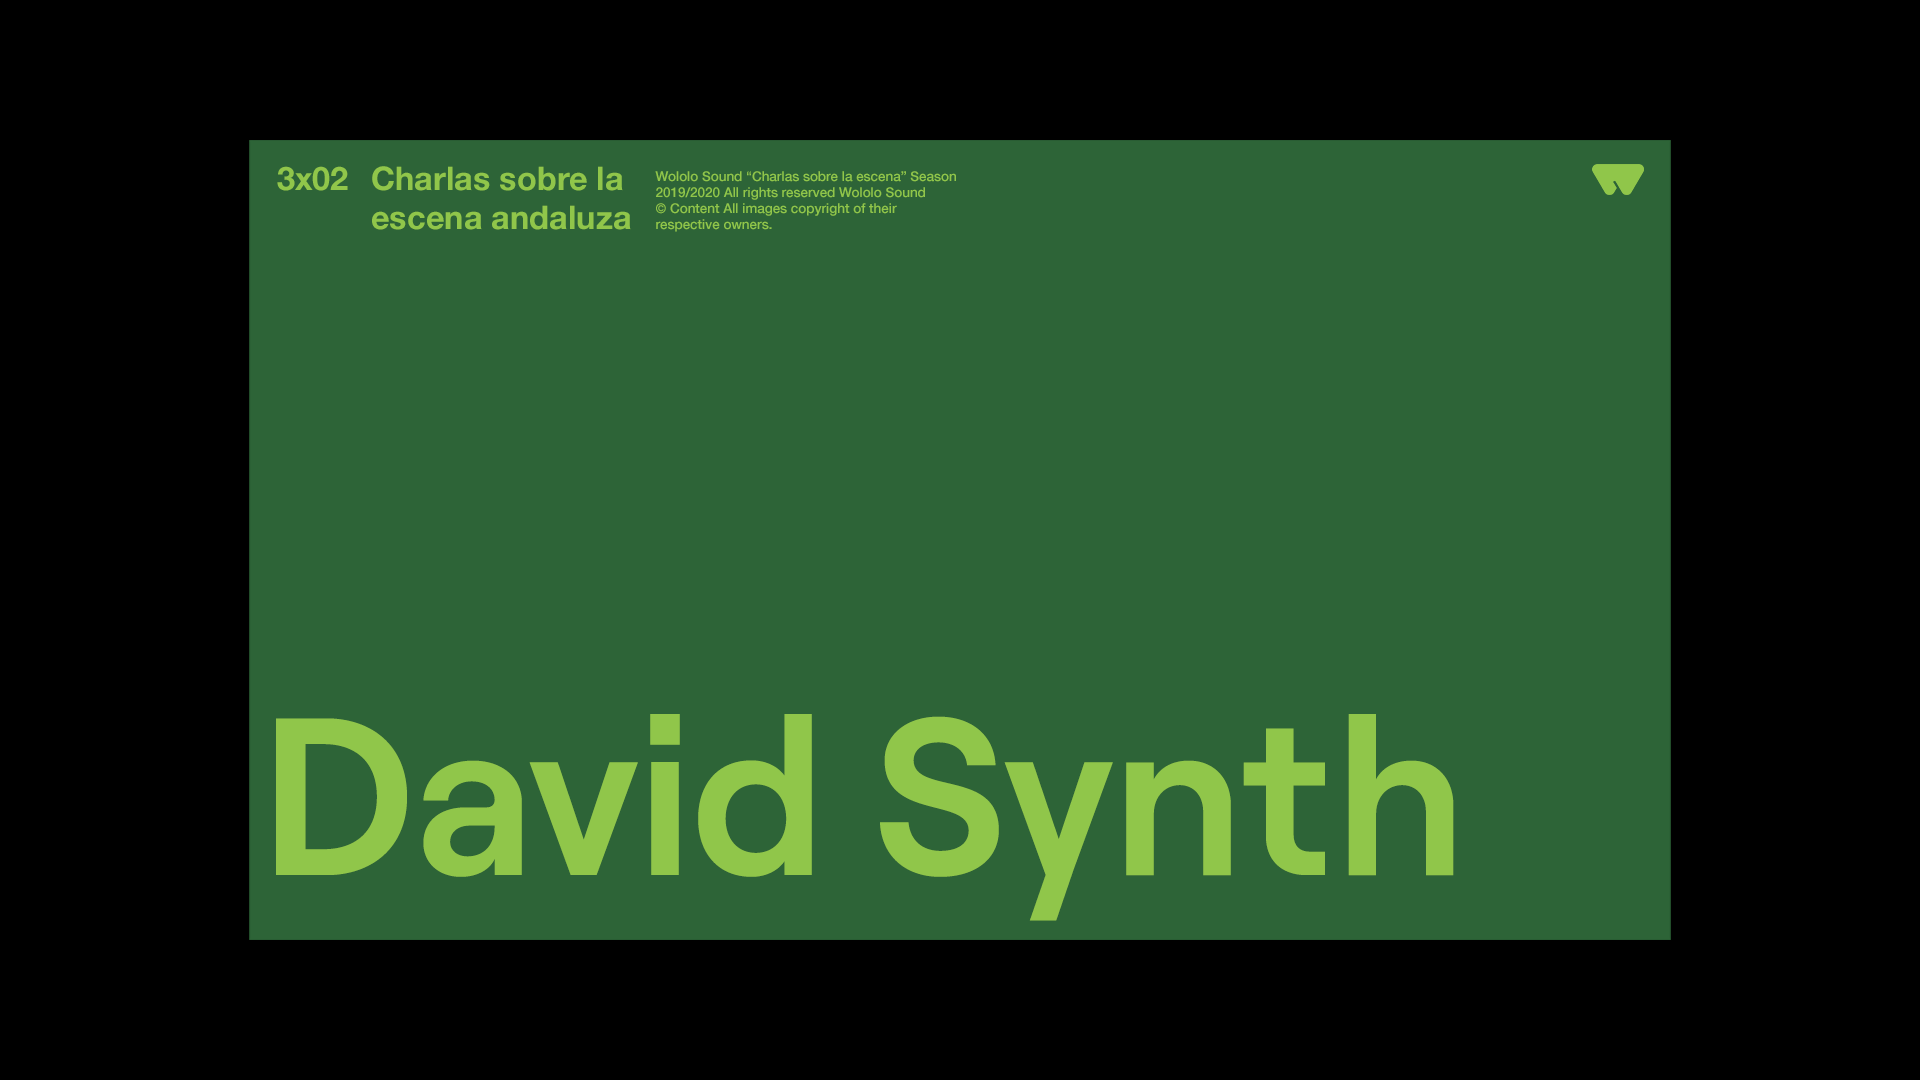 DAVID SYNTH